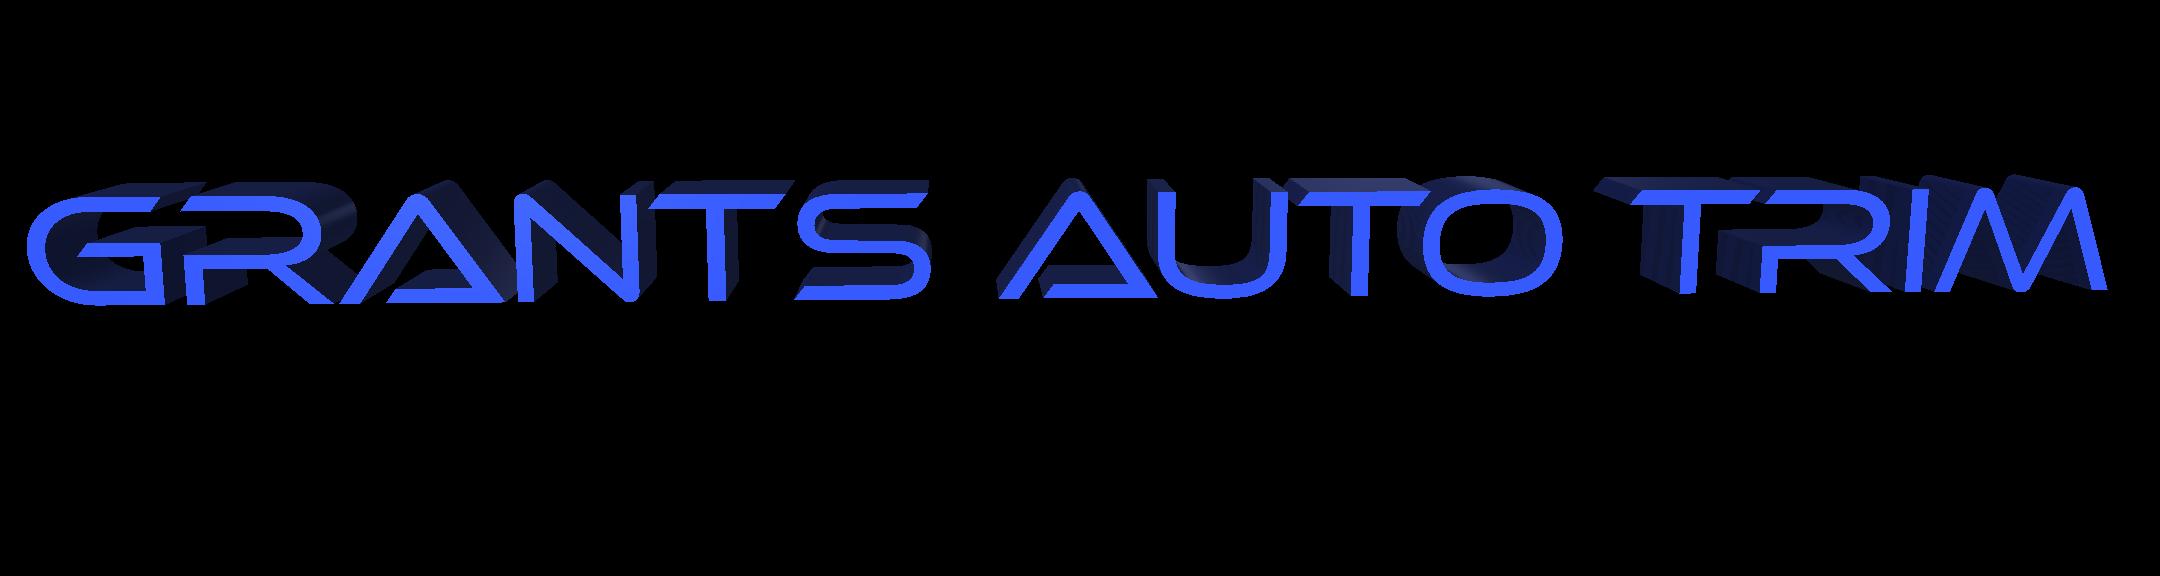 Grants Auto Trim